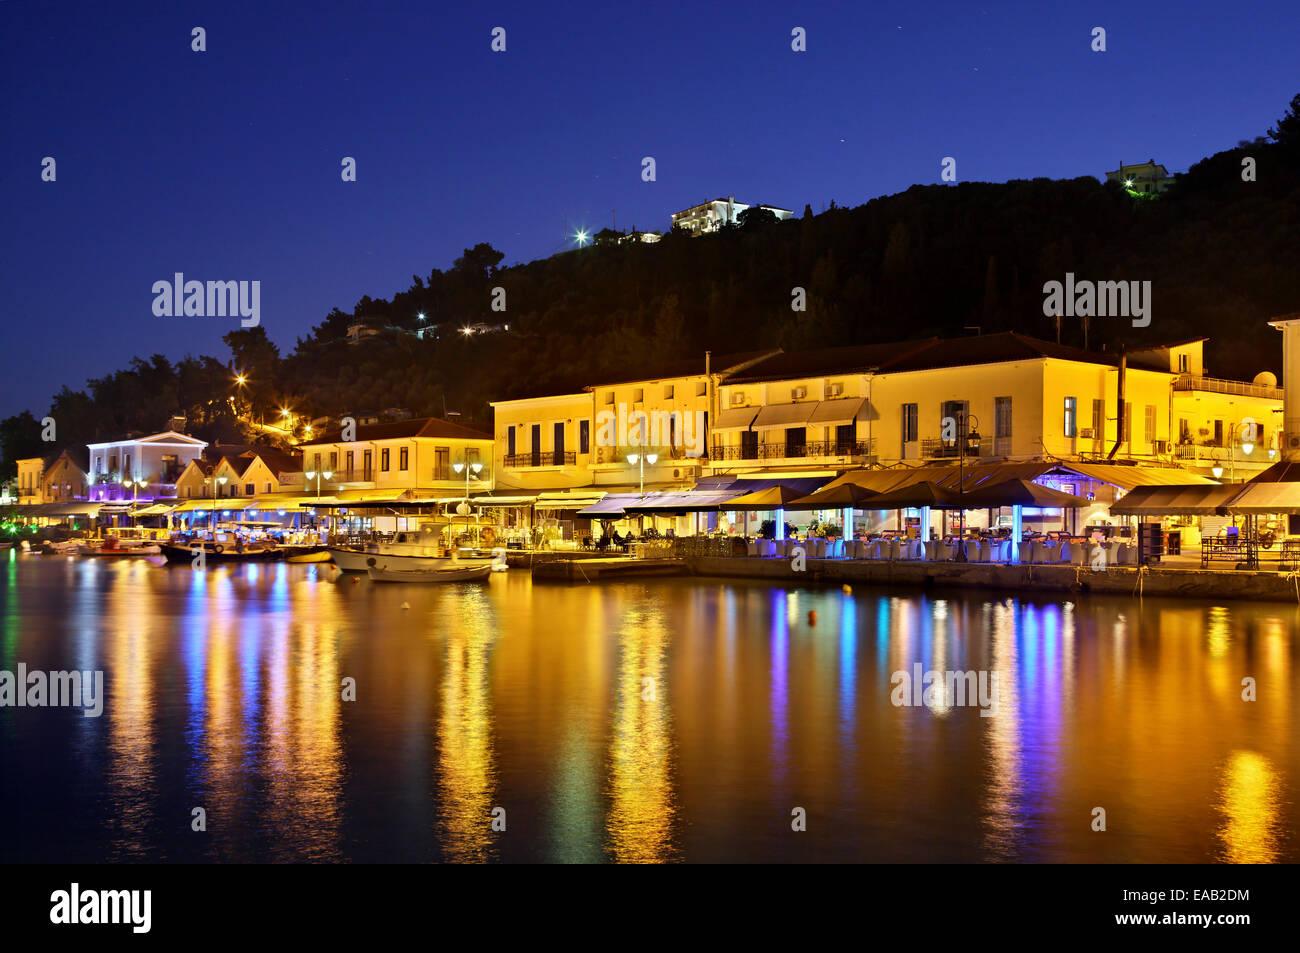 The port of Katakolo (popular cruise ship anchorage) close to Ancient Olympia, Ileia, Peloponnese, Greece. - Stock Image